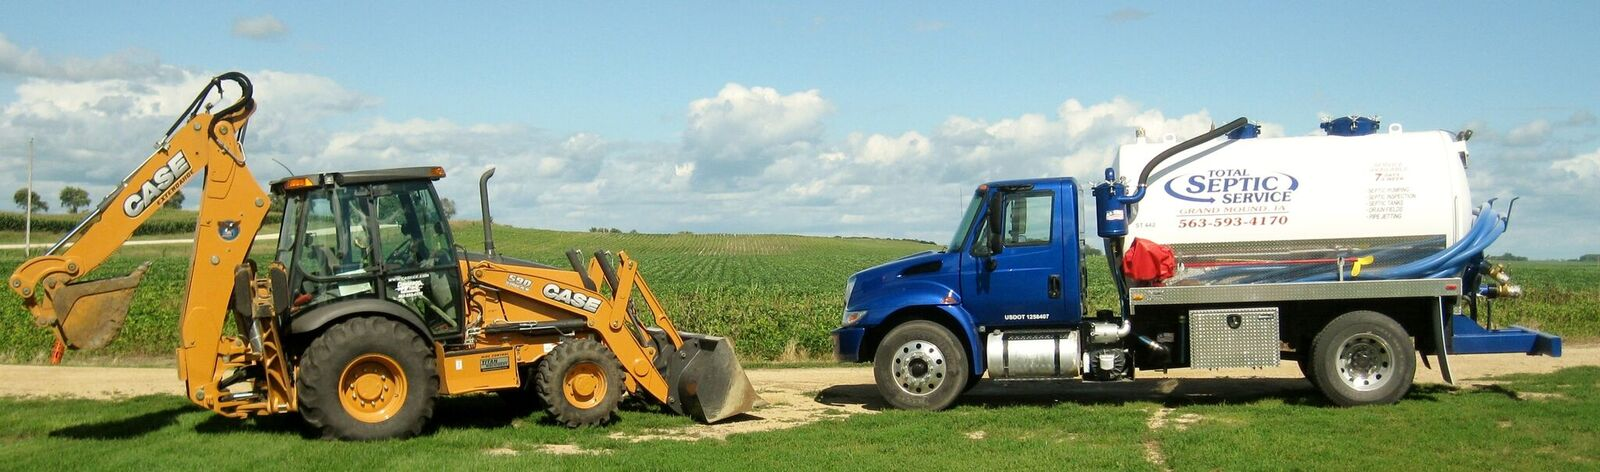 farm drainage tiling